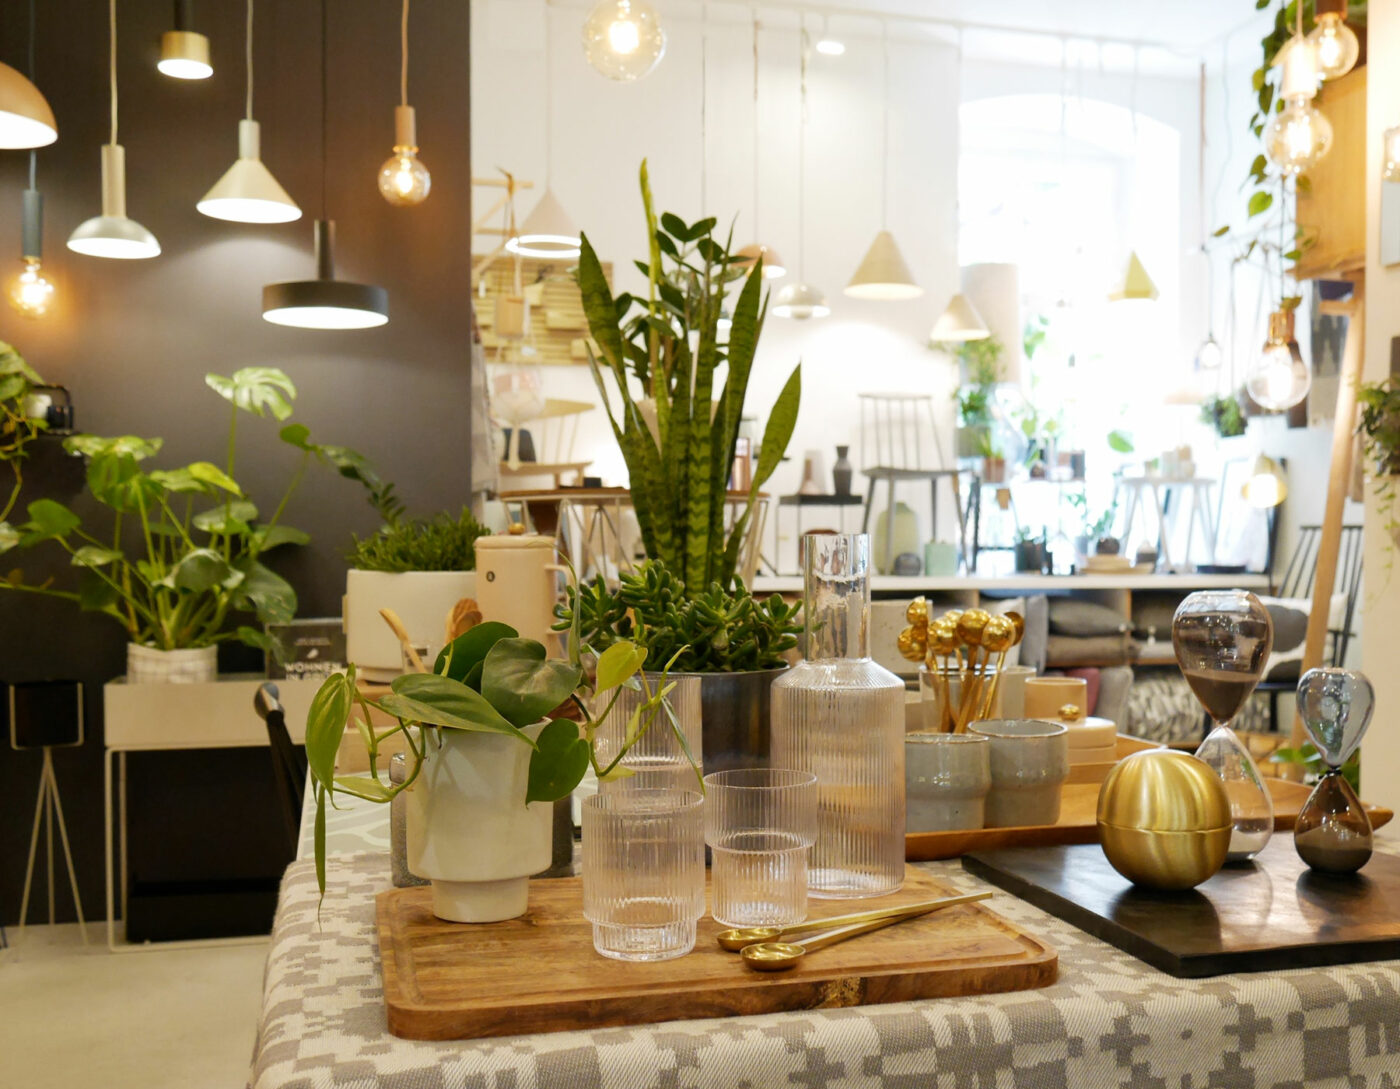 Shoppingtipp Berlin-Friedrichshain: hAusen // HIMBEER